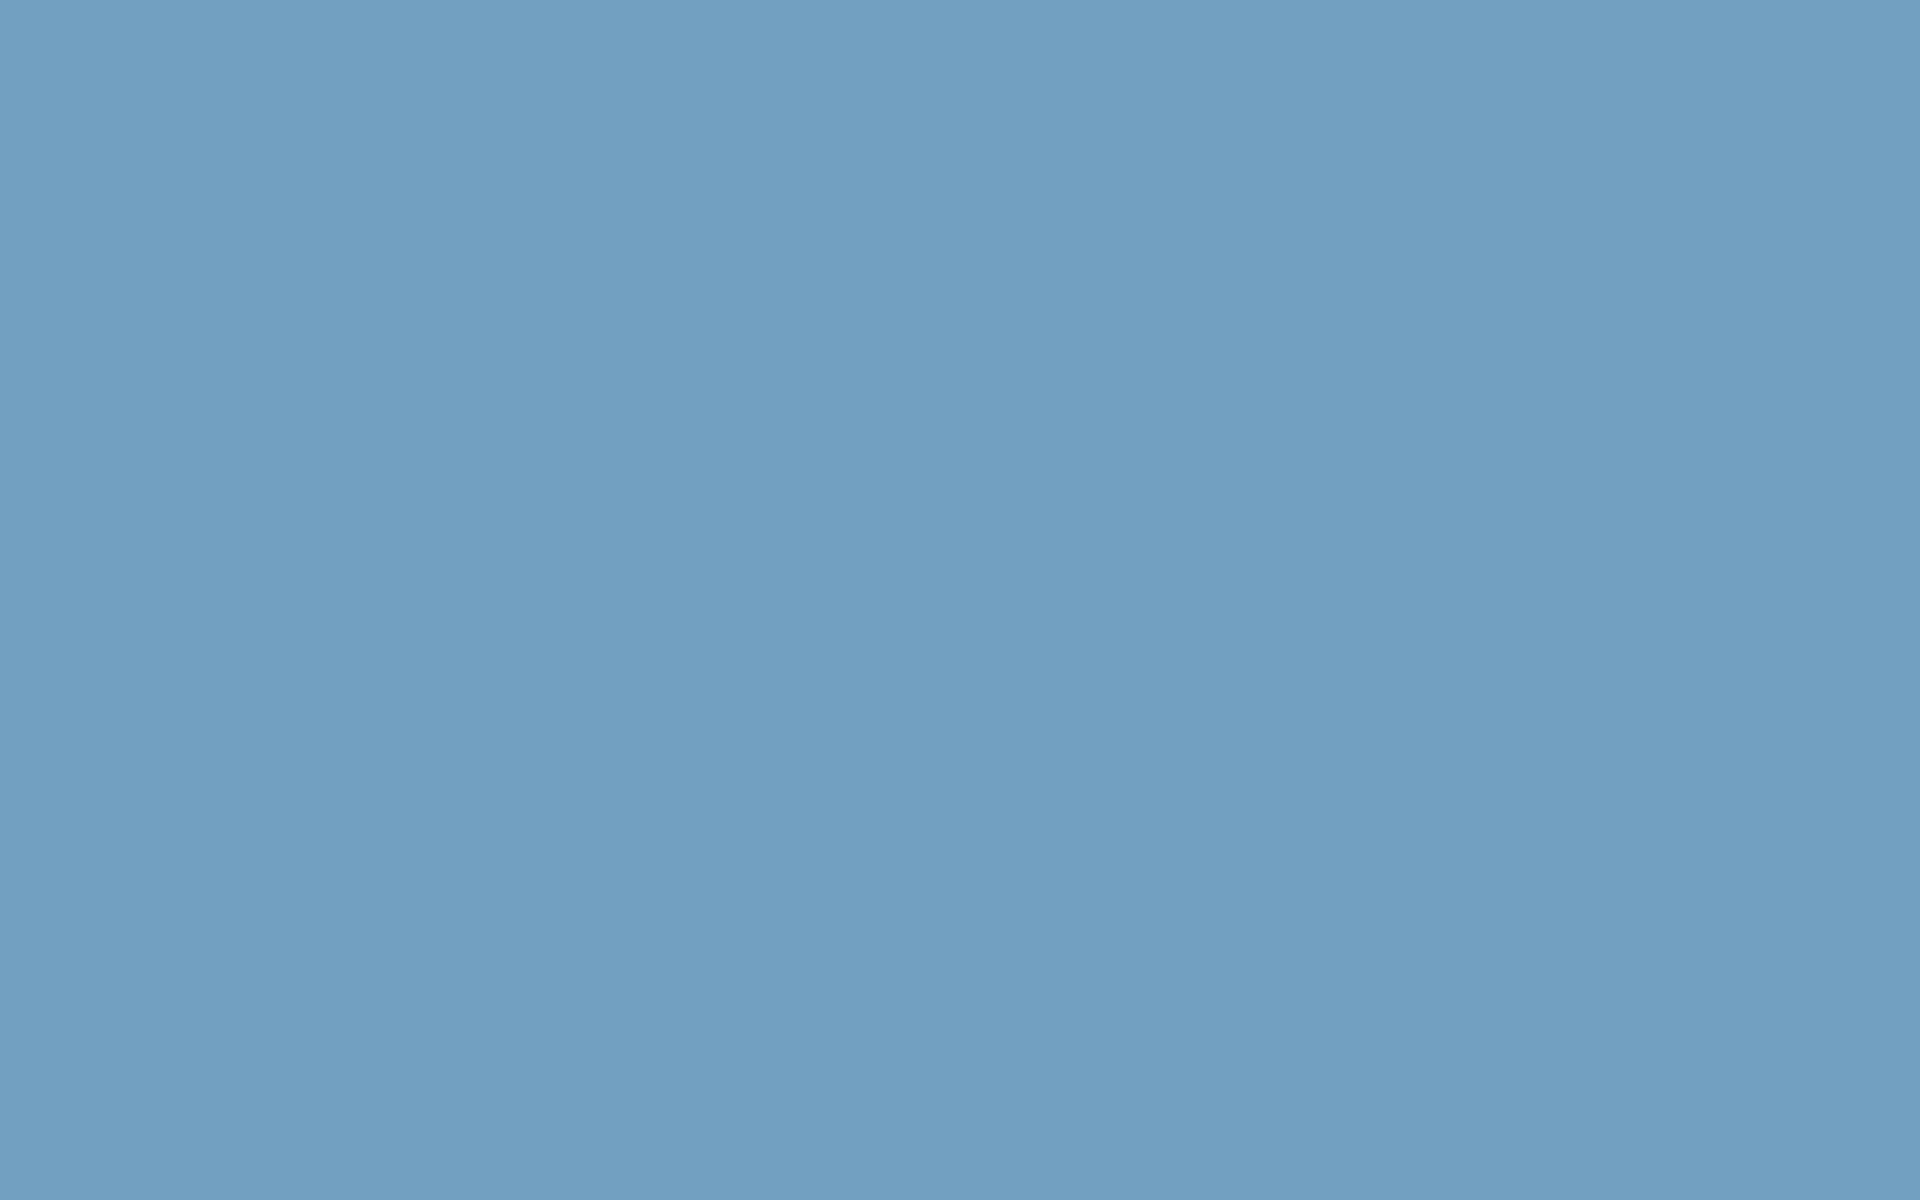 a movie analysis of the color of paradise Amazoncom: the color of paradise: mohsen ramezani, elham sharifi, hossein mahjub, majid majidi, mehdi karimi, ali ghaem maghami, mehdi mahabadi, mohsen sarab, varahonar company: movies & tv  see all 116 customer reviews.